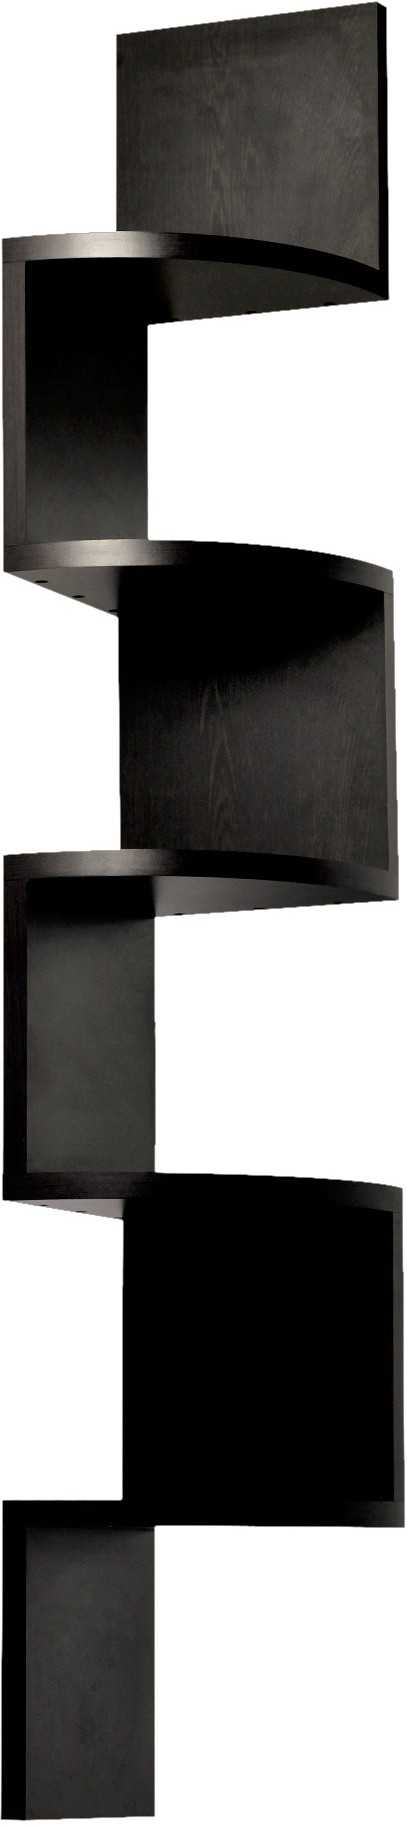 View Bluewud Morpheus Engineered Wood Open Book Shelf(Finish Color - Wenge) Furniture (Bluewud)